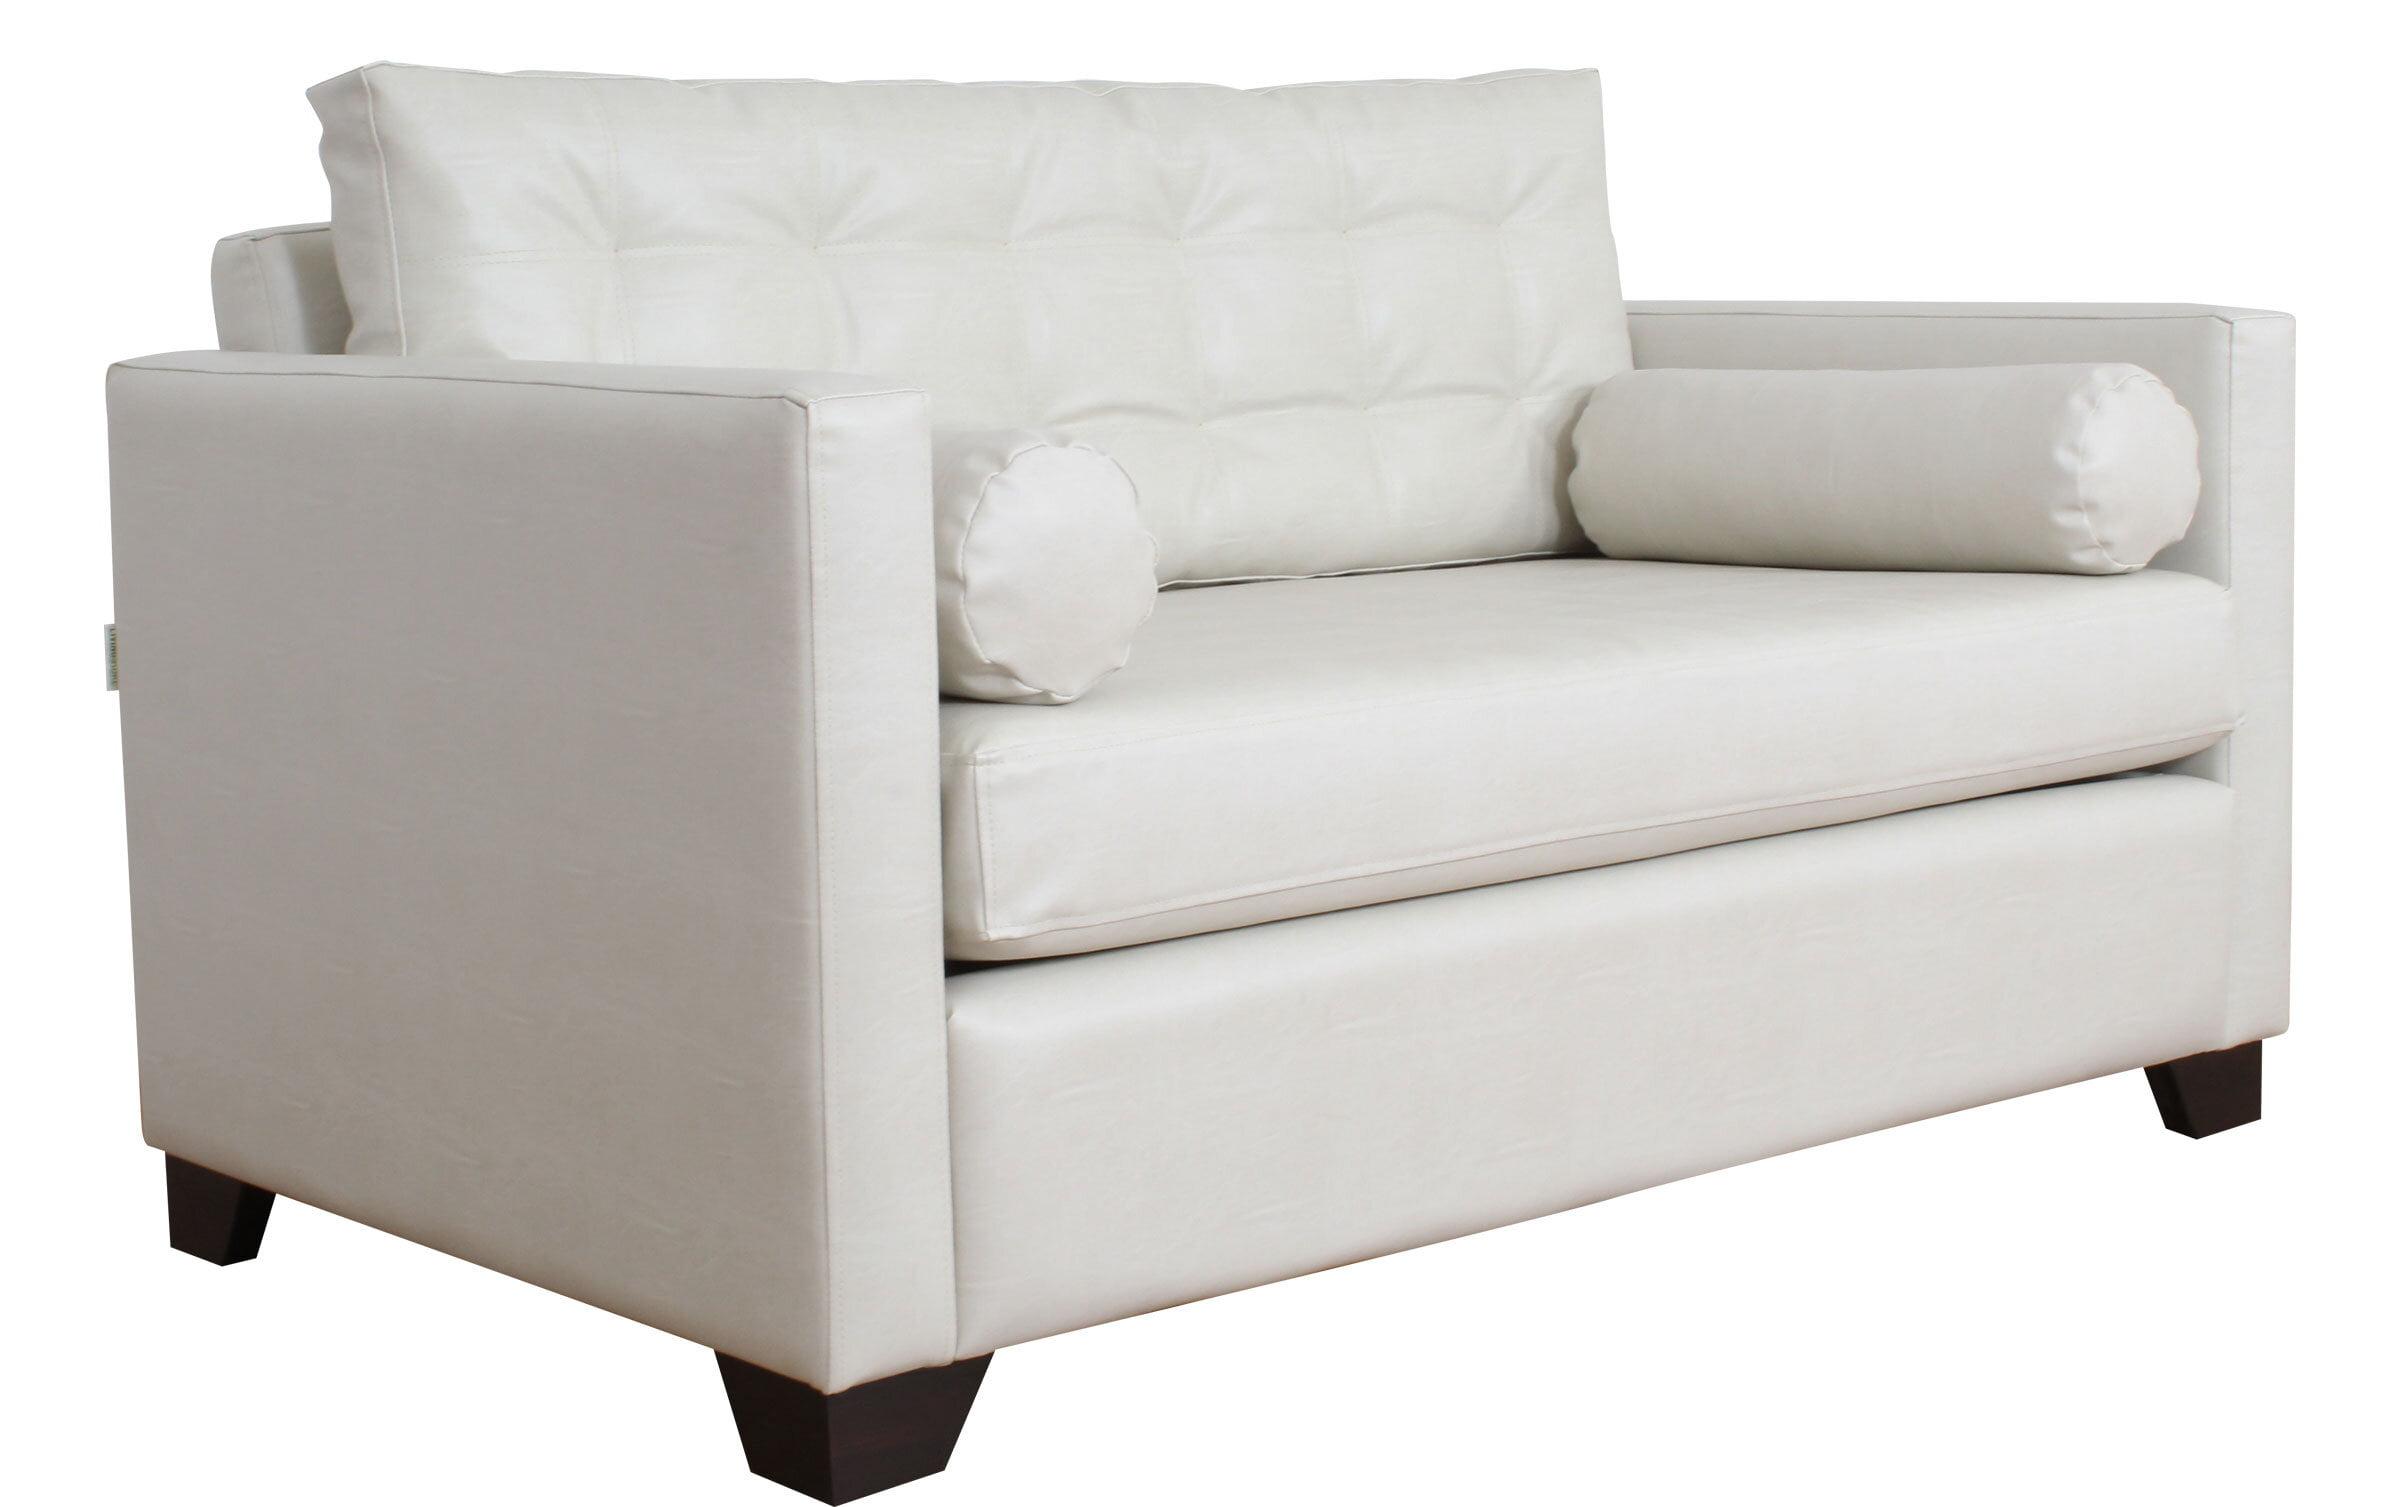 Sofa Cama Master Gelo 1